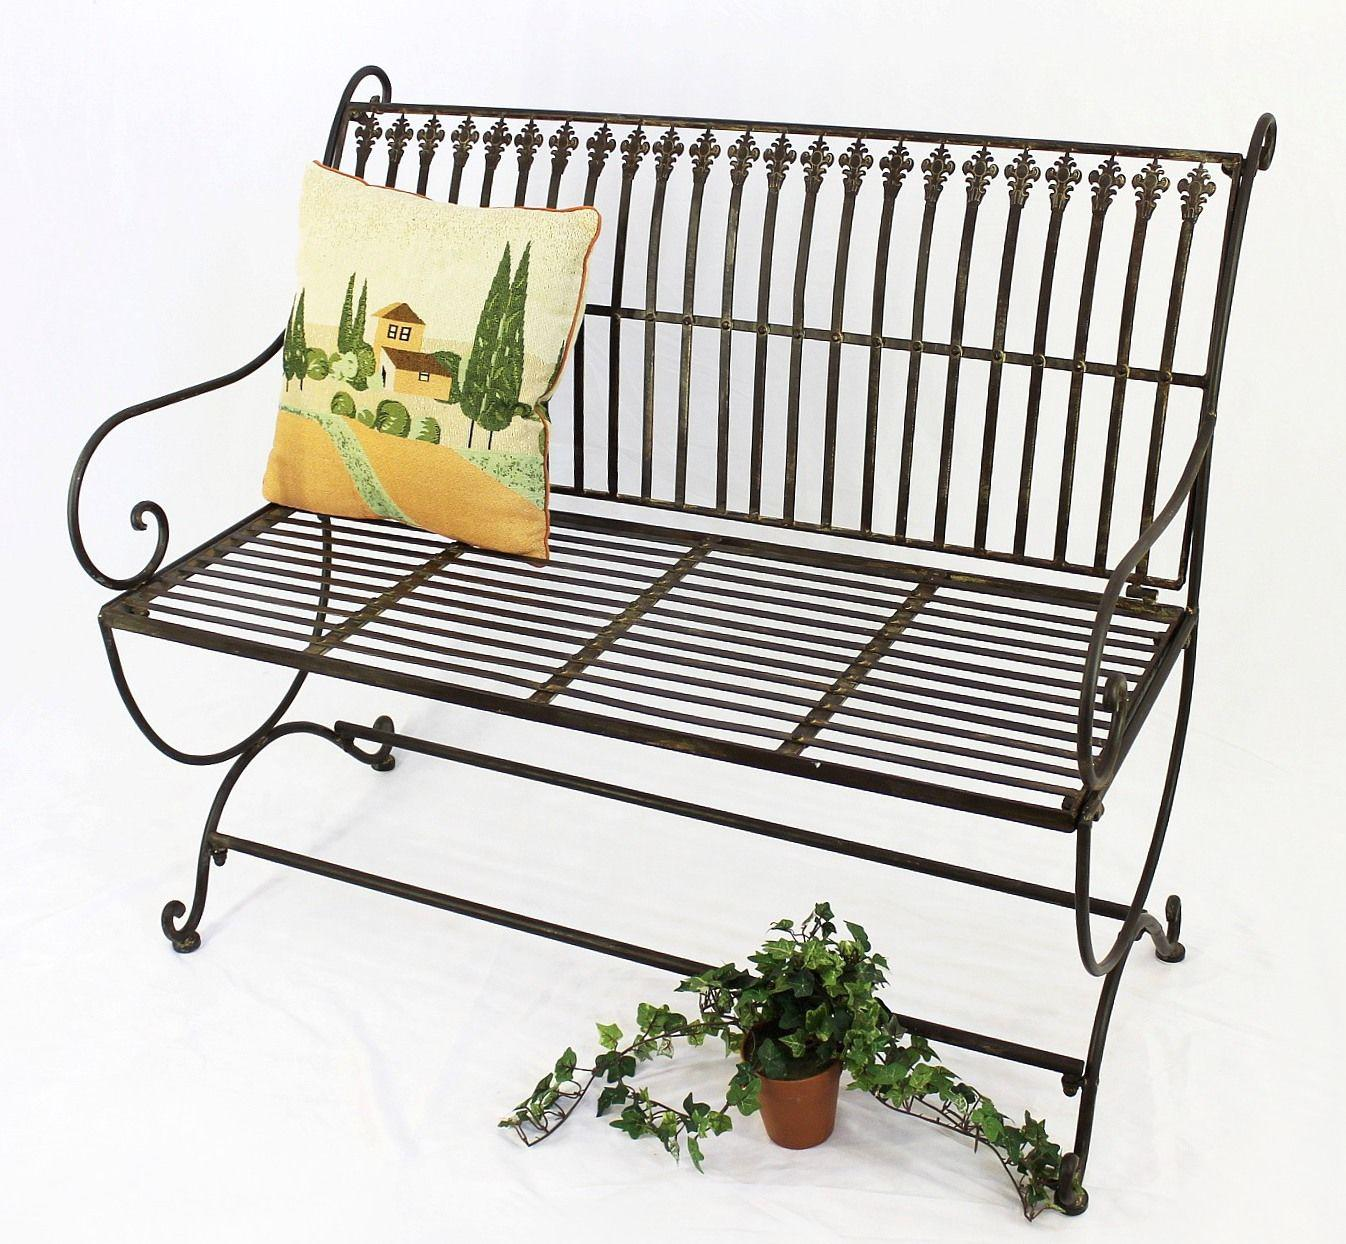 bank finca 063 2 sitzer aus metall gartenbank sitzbank baumbank 102 cm braun ebay. Black Bedroom Furniture Sets. Home Design Ideas